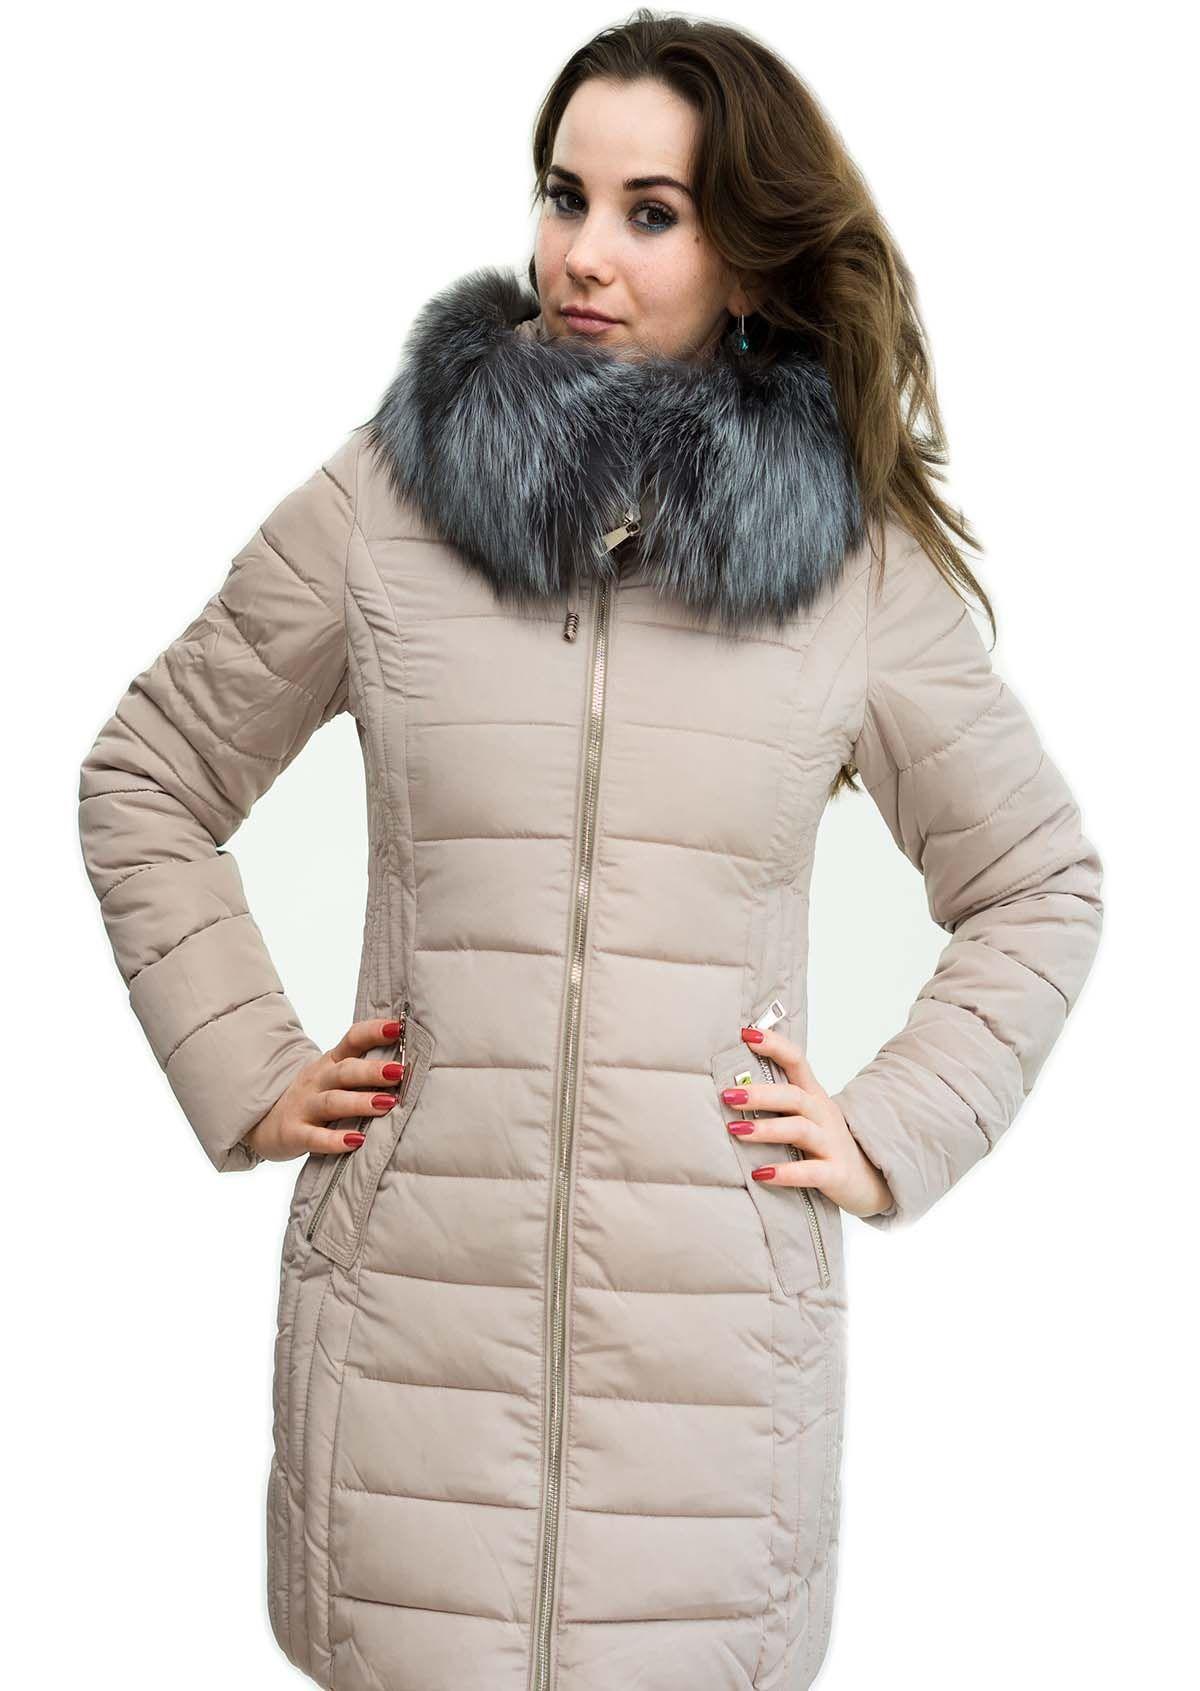 8a2181e97d3cae Ein wunderschöner Mantel mit abnehmbaren Silberfuchs Pelzkragen der auch  als großzügige Echtfellkapuze dienen kann, sodass